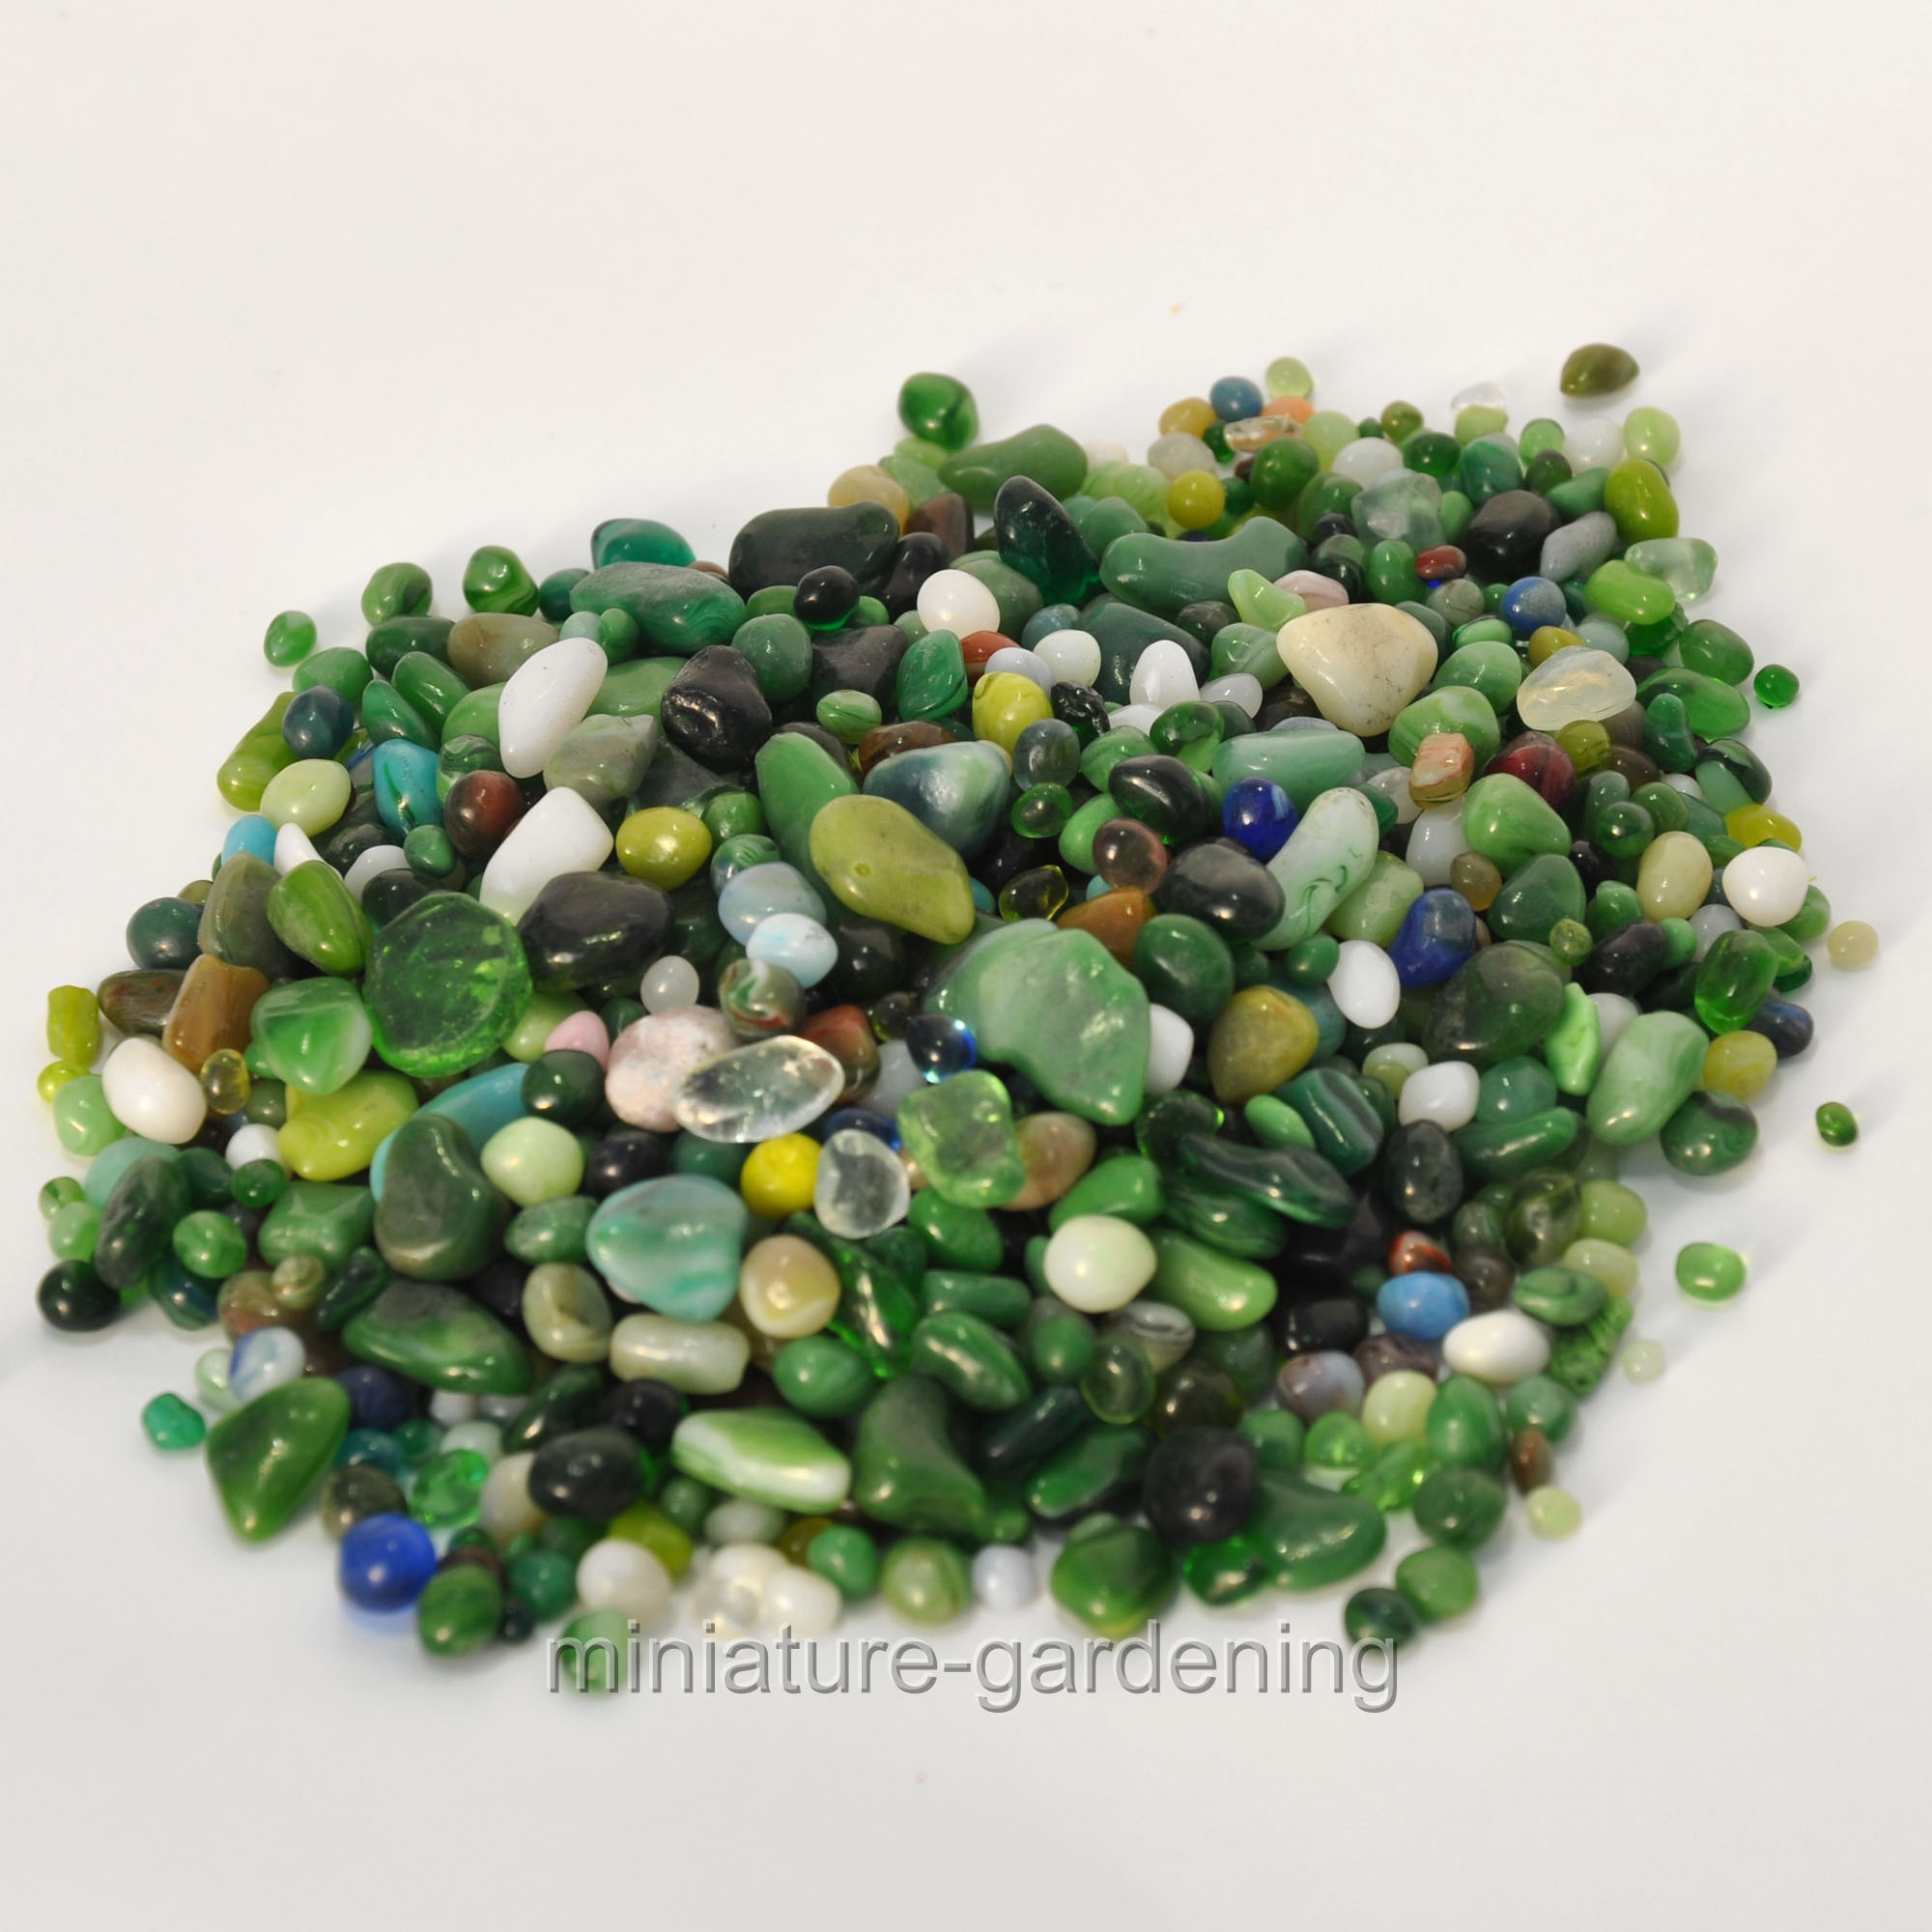 Accent Decor Forest Glass Pebbles for Miniature Garden, Fairy Garden by Accent Decor, Inc.